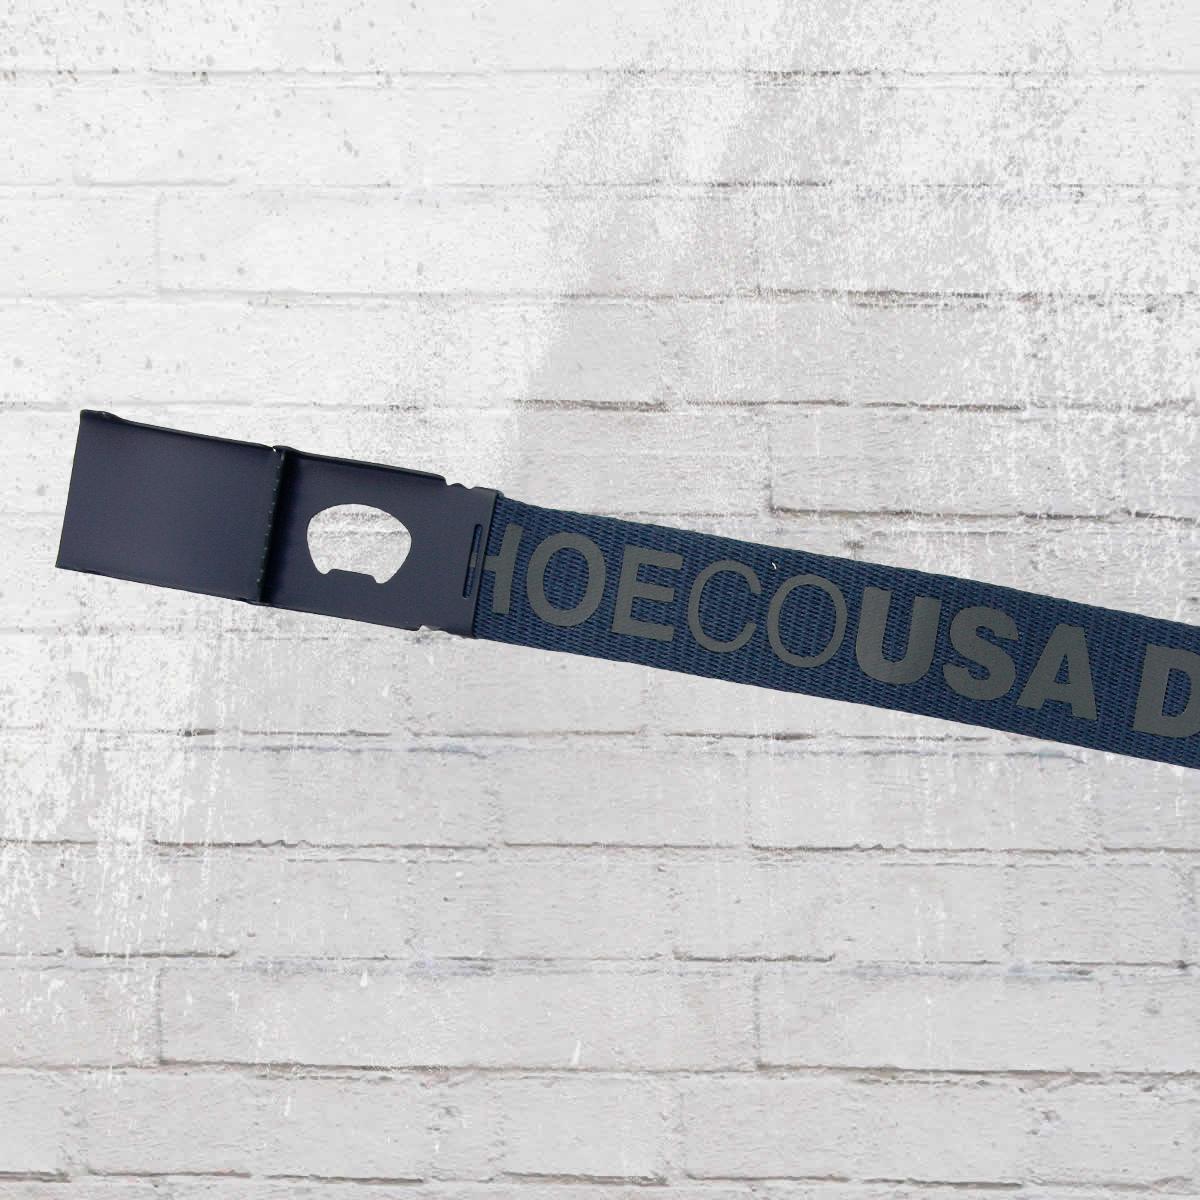 Billabong Leder Gürtel Pole Jam Leather Belt Schwarz Ab 24,99 U20ac. Schließen.  DC Shoes Wende Stoff Gürtel Chinook 6 Reversible Belt Blau Grau